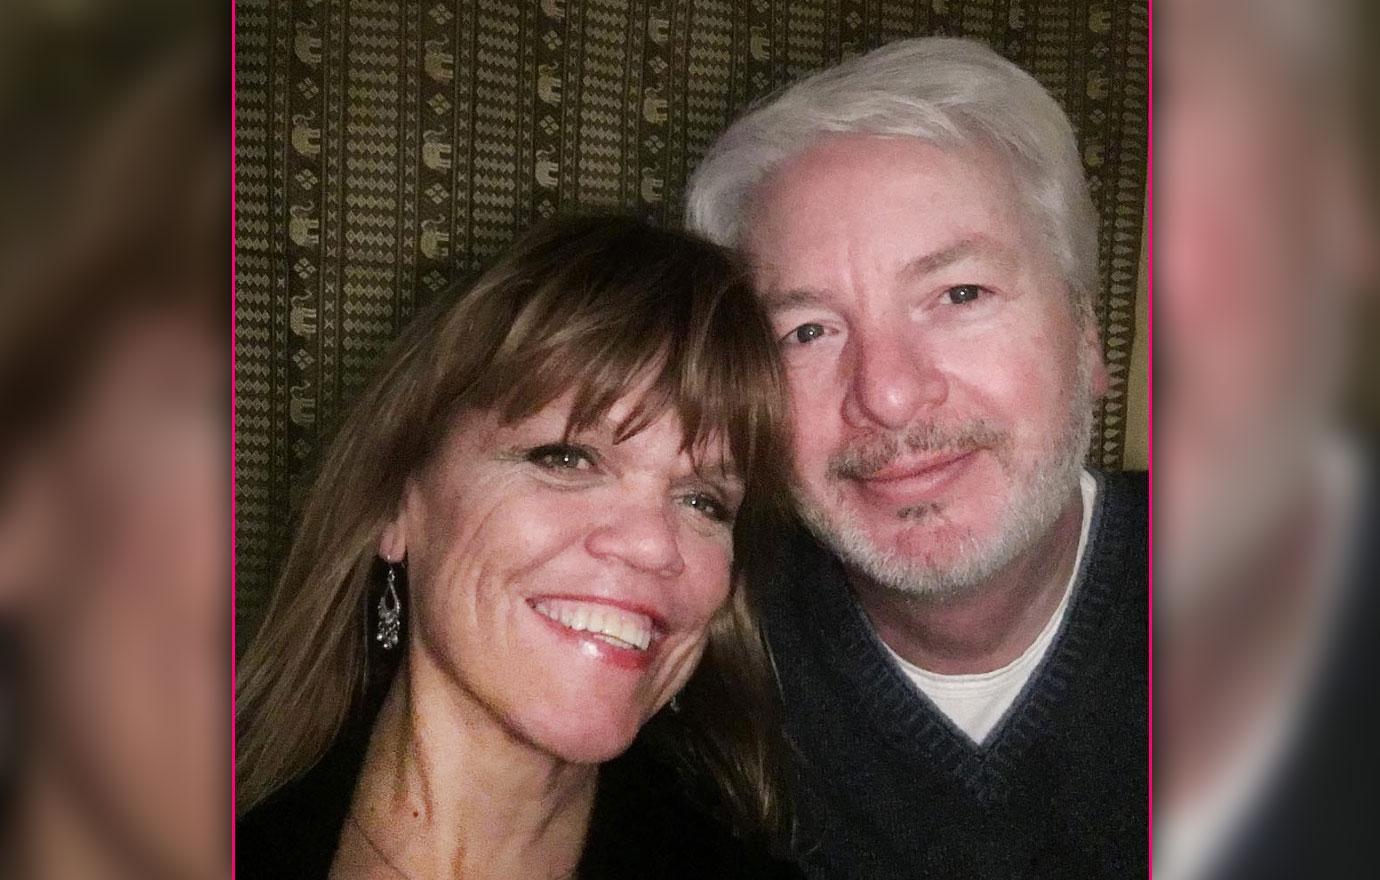 Amy Roloff Celebrates Boyfriend Chris Marek's Birthday